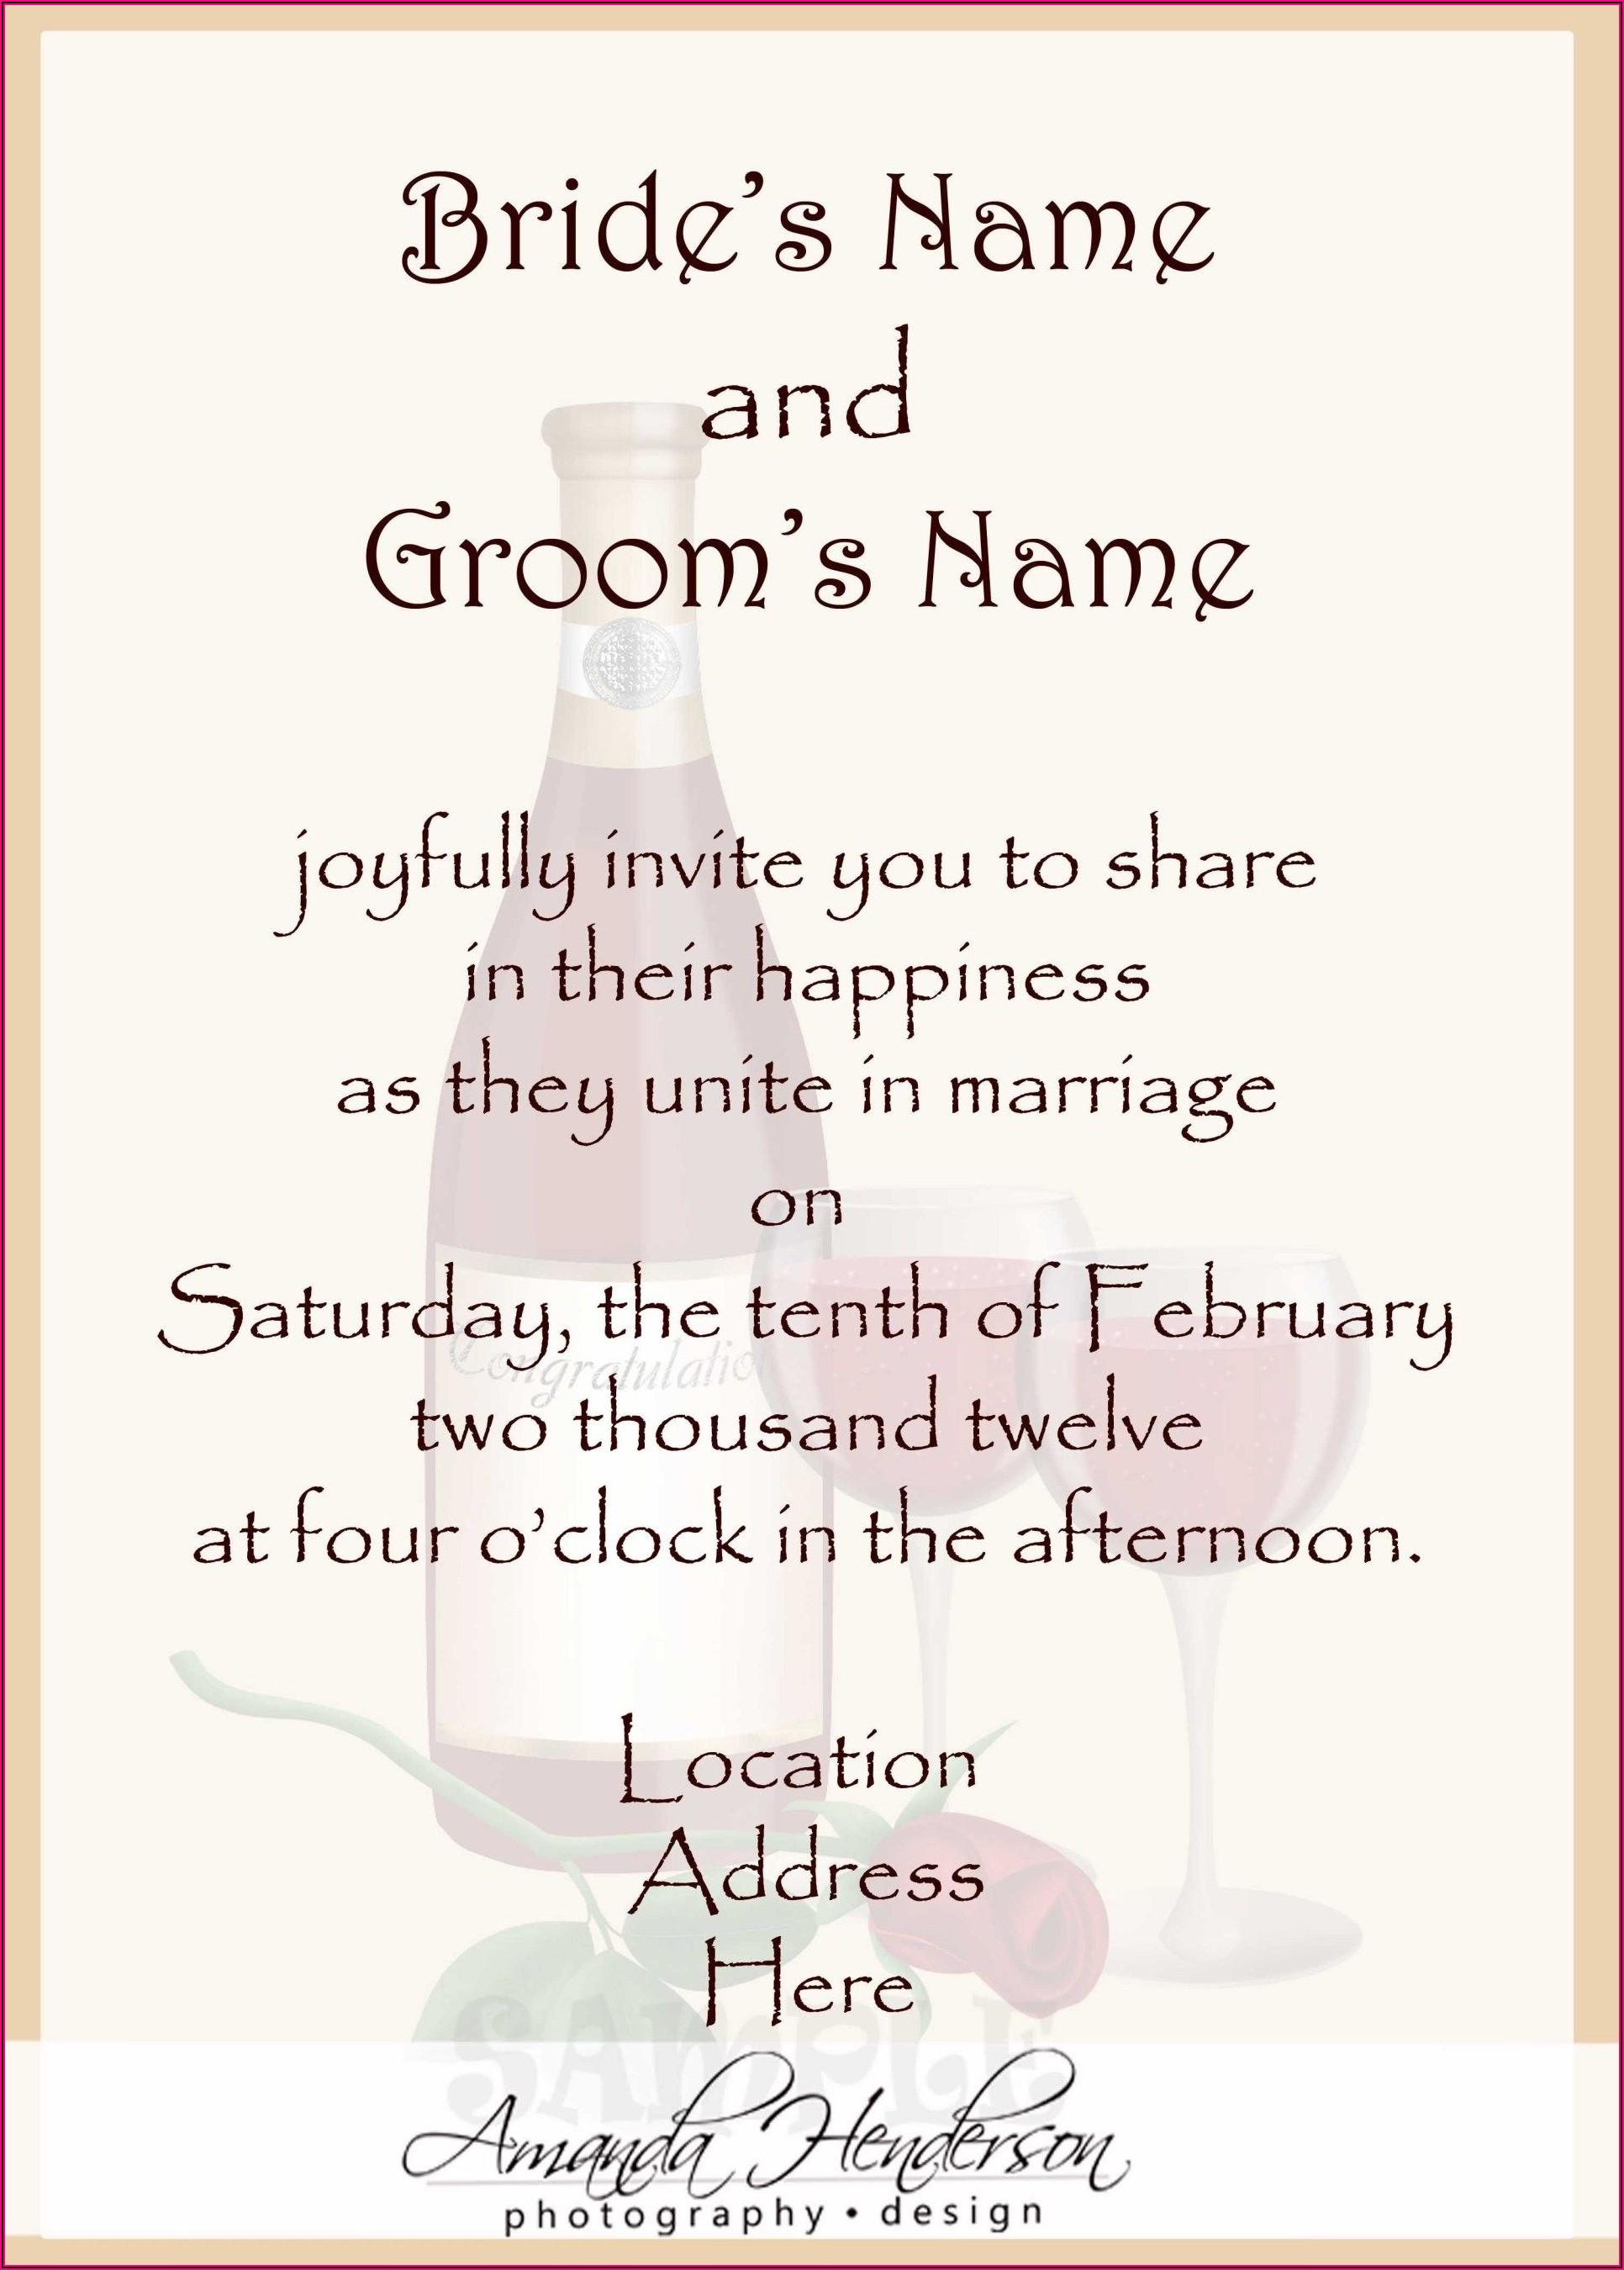 Spanish Wedding Invitation Wording From Bride And Groom